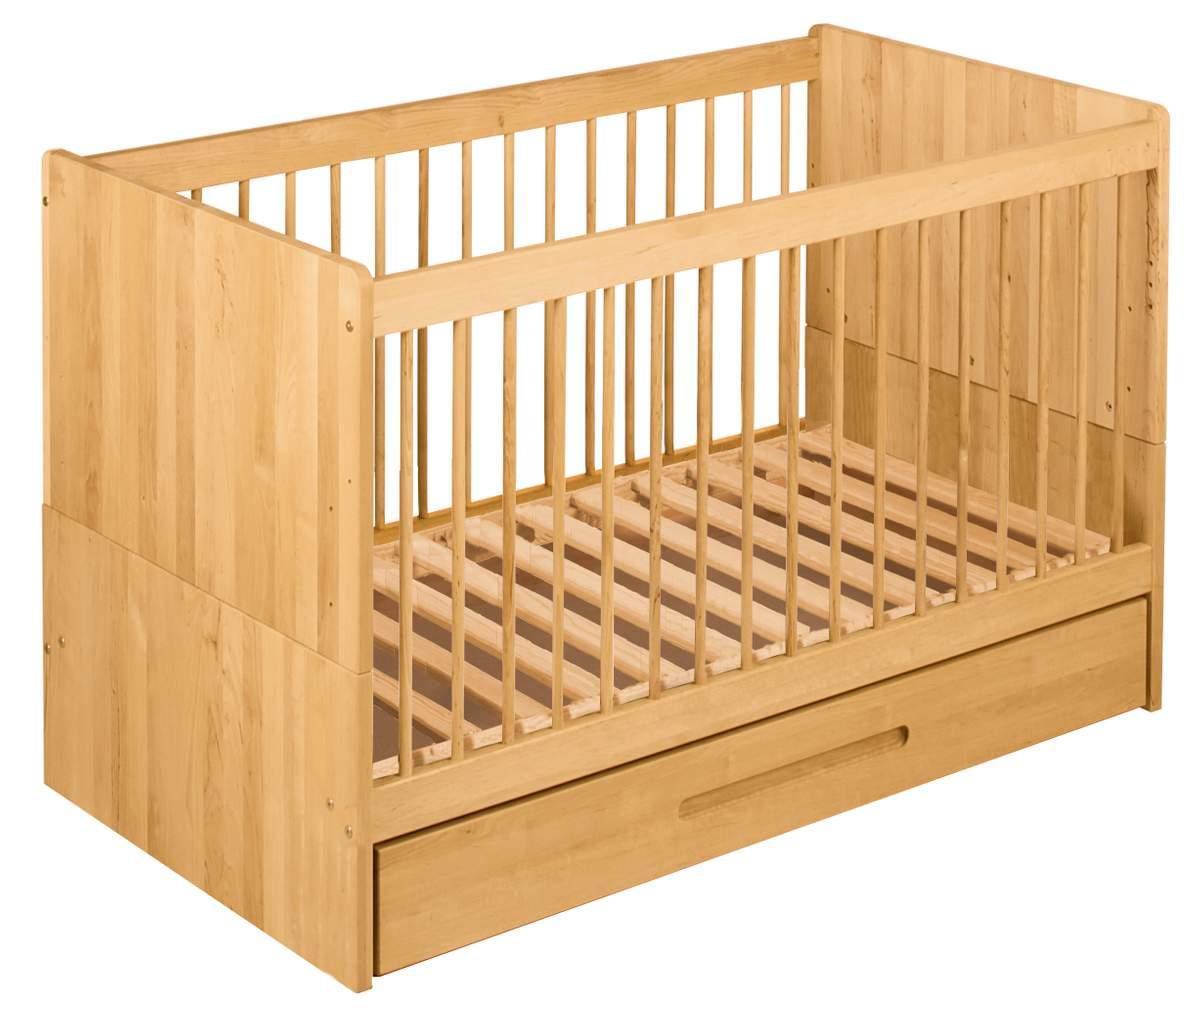 biokinder spar set lina babybett mit bettkasten 70x140 cm. Black Bedroom Furniture Sets. Home Design Ideas